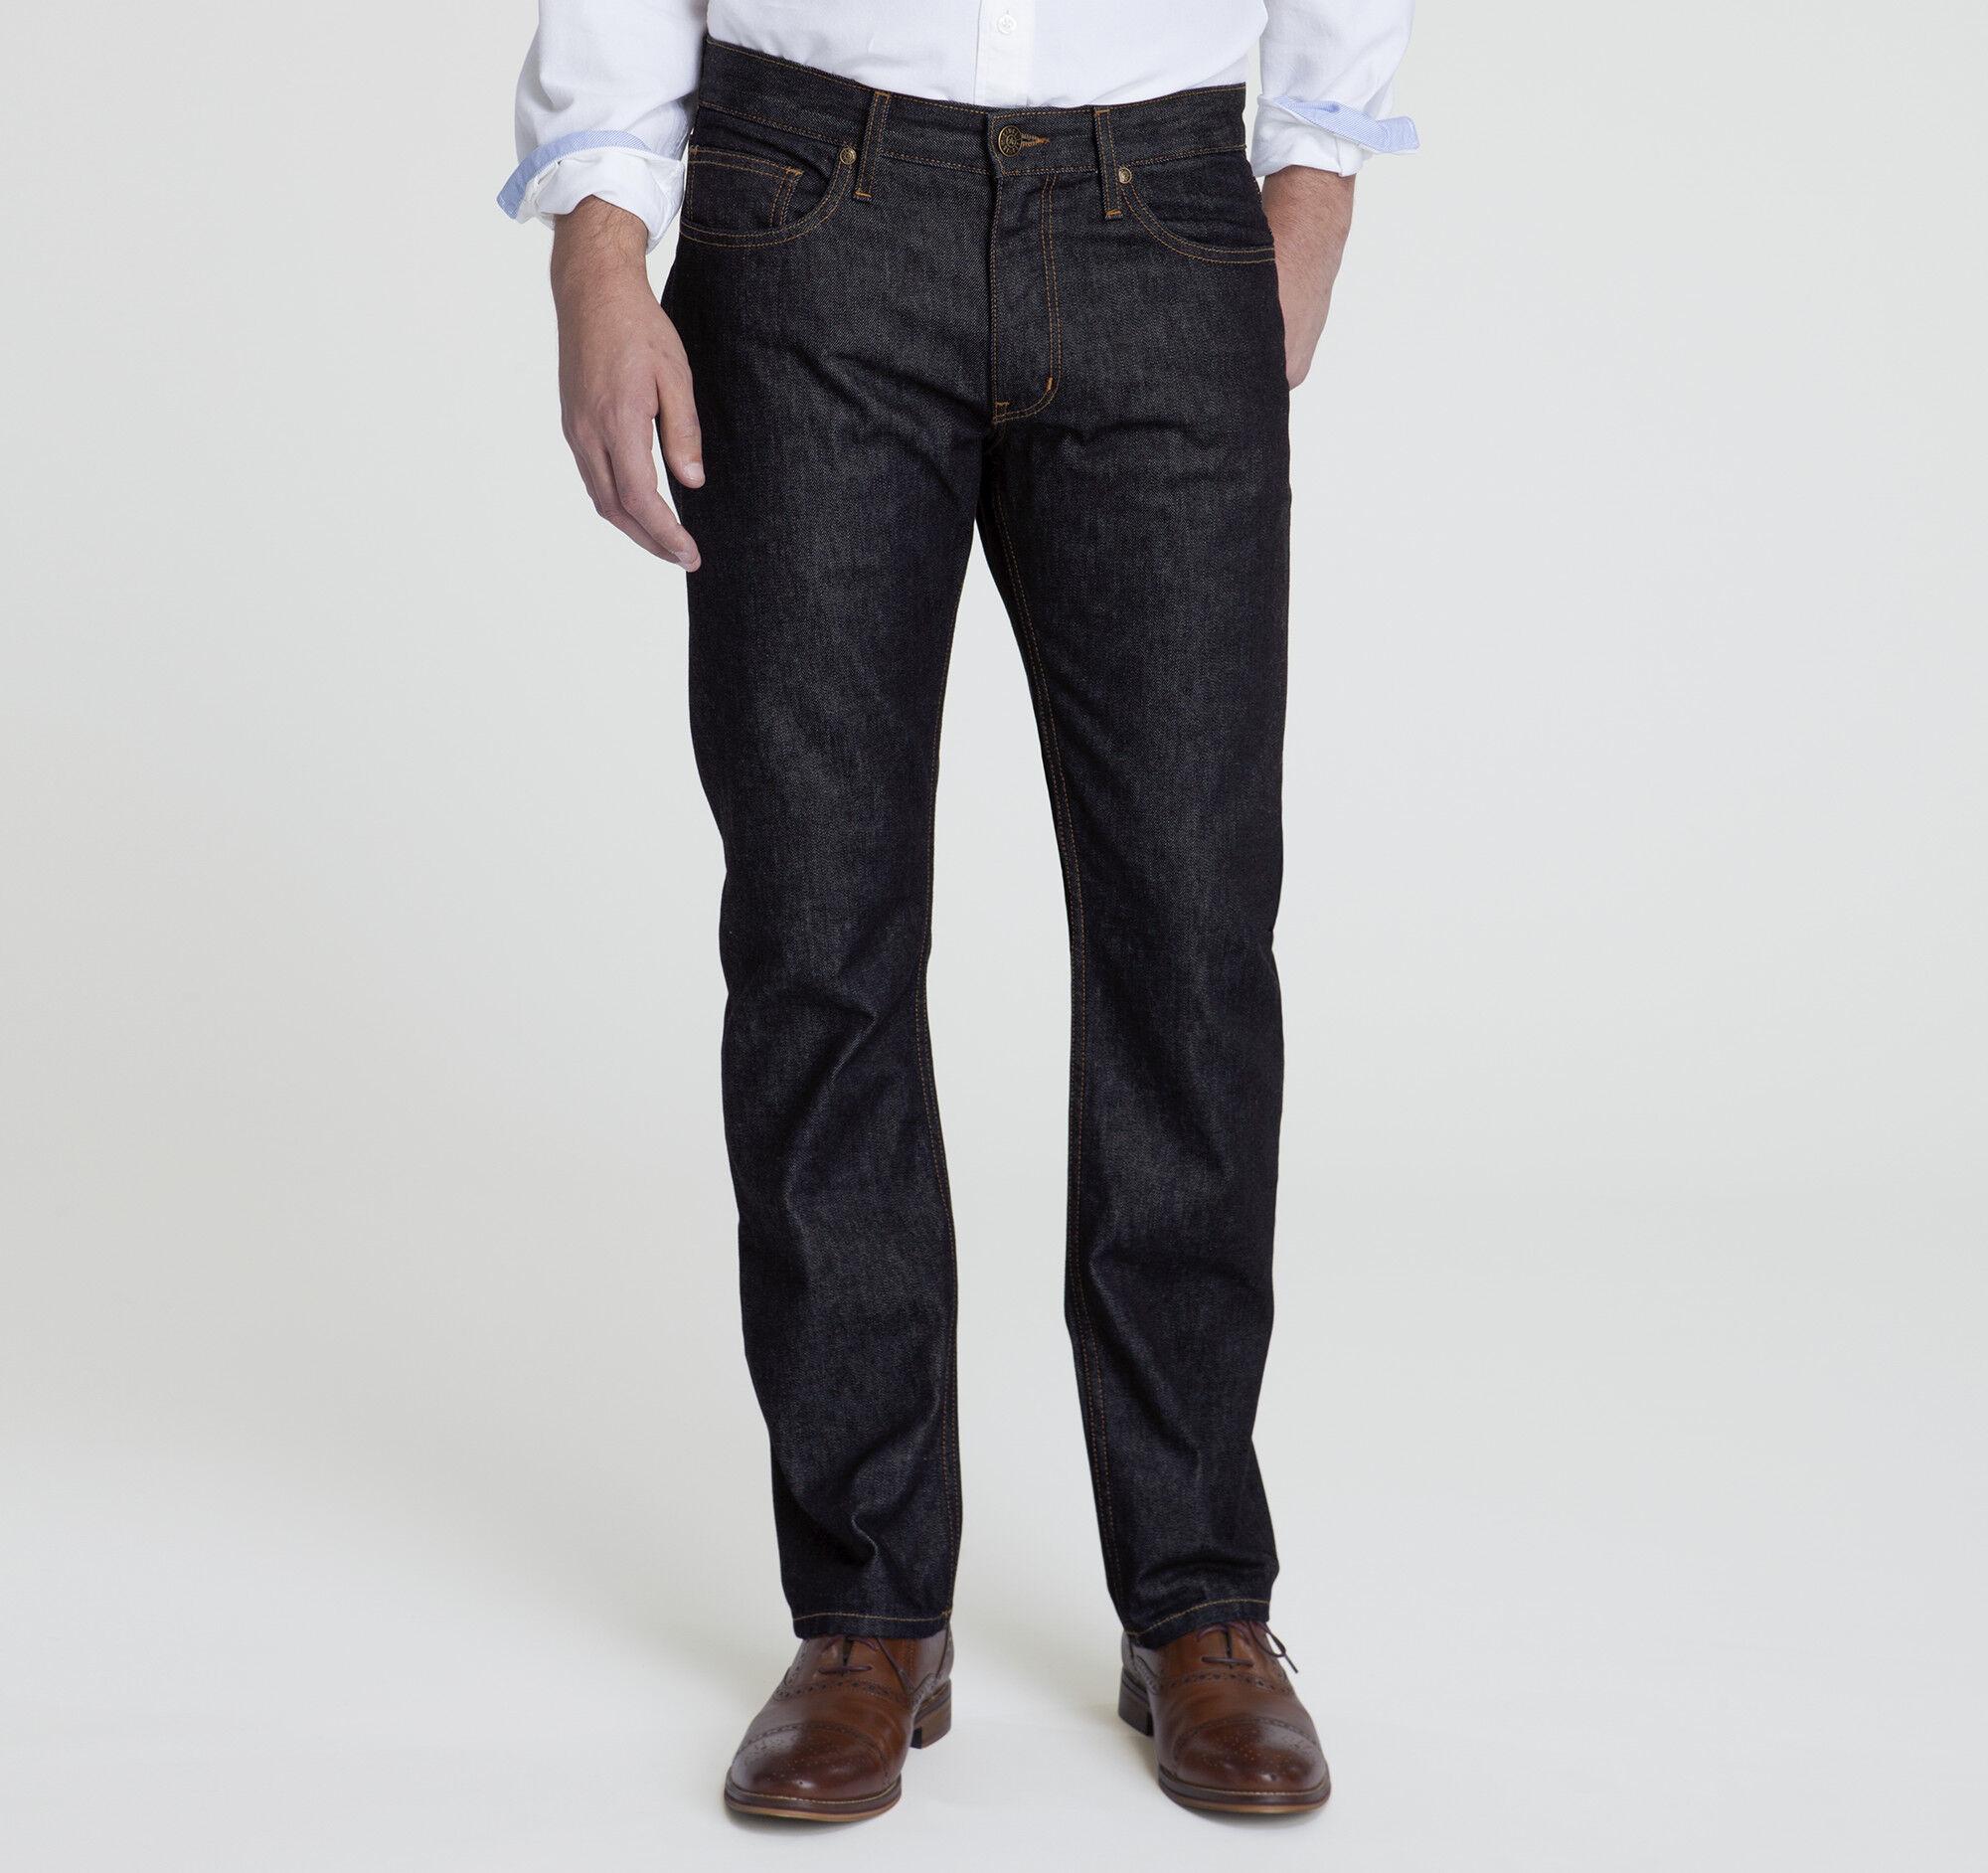 pijama suave parte inferior de algod/ón Style It Up Pantalones de sal/ón para hombre c/álido